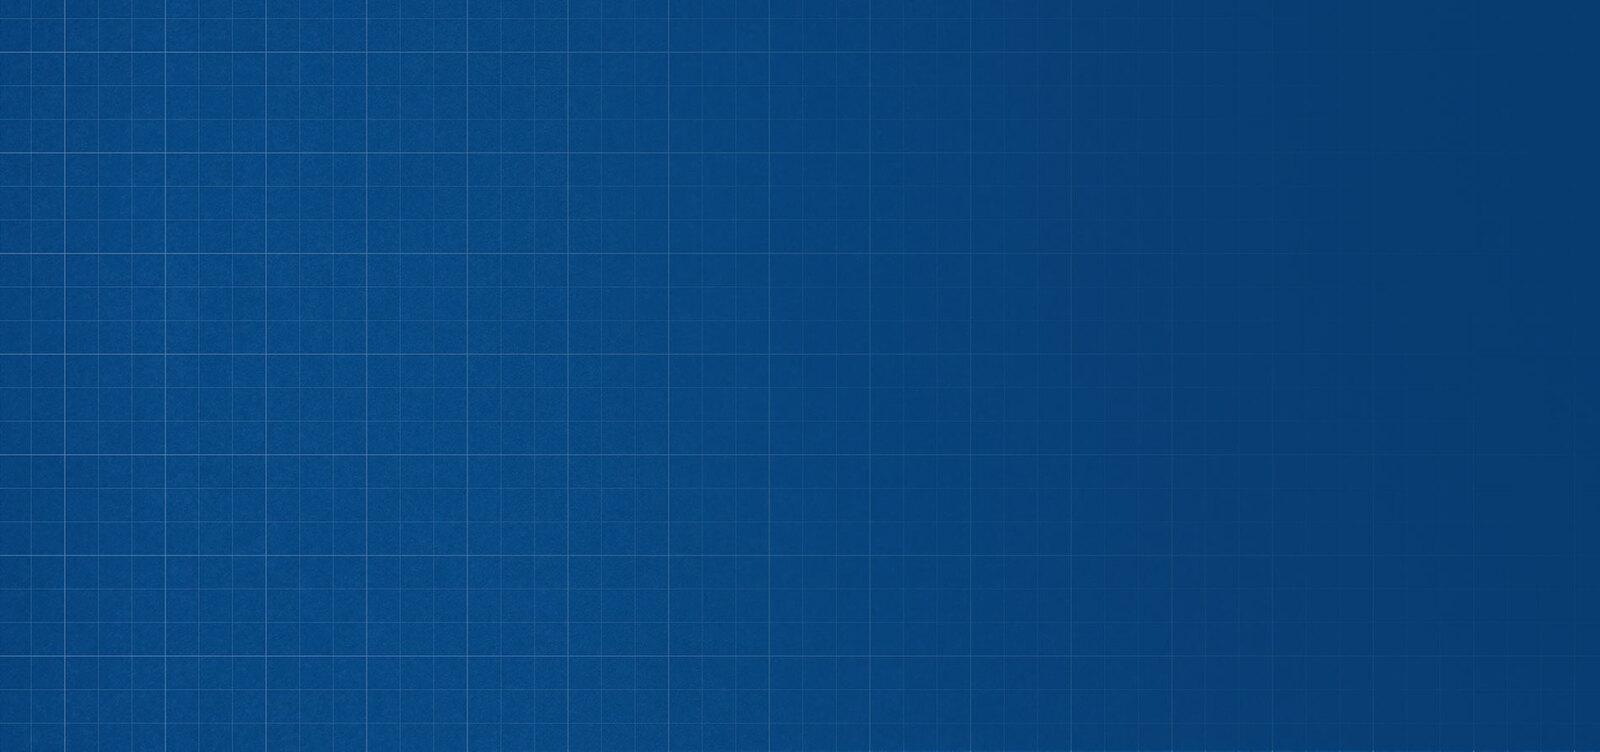 blue-grid-fade-BG